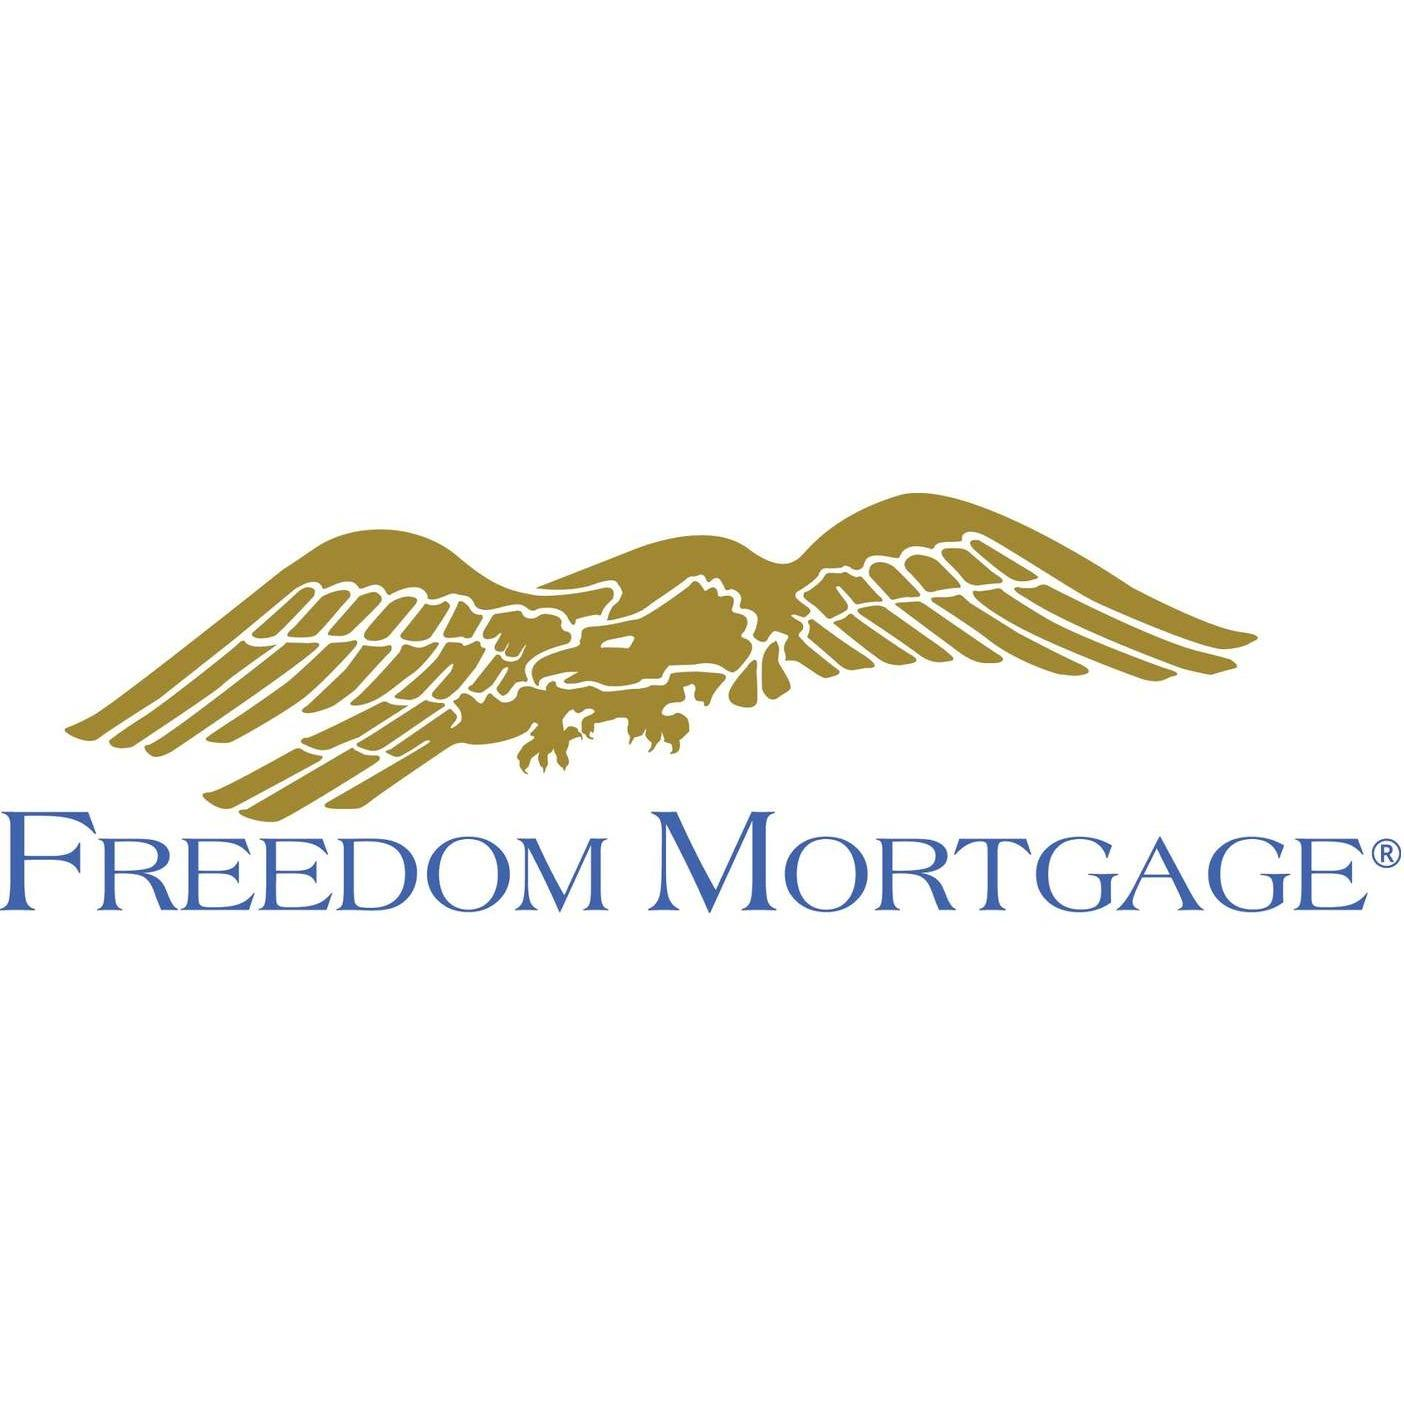 Roberta Smith - Freedom Mortgage Corporation image 1